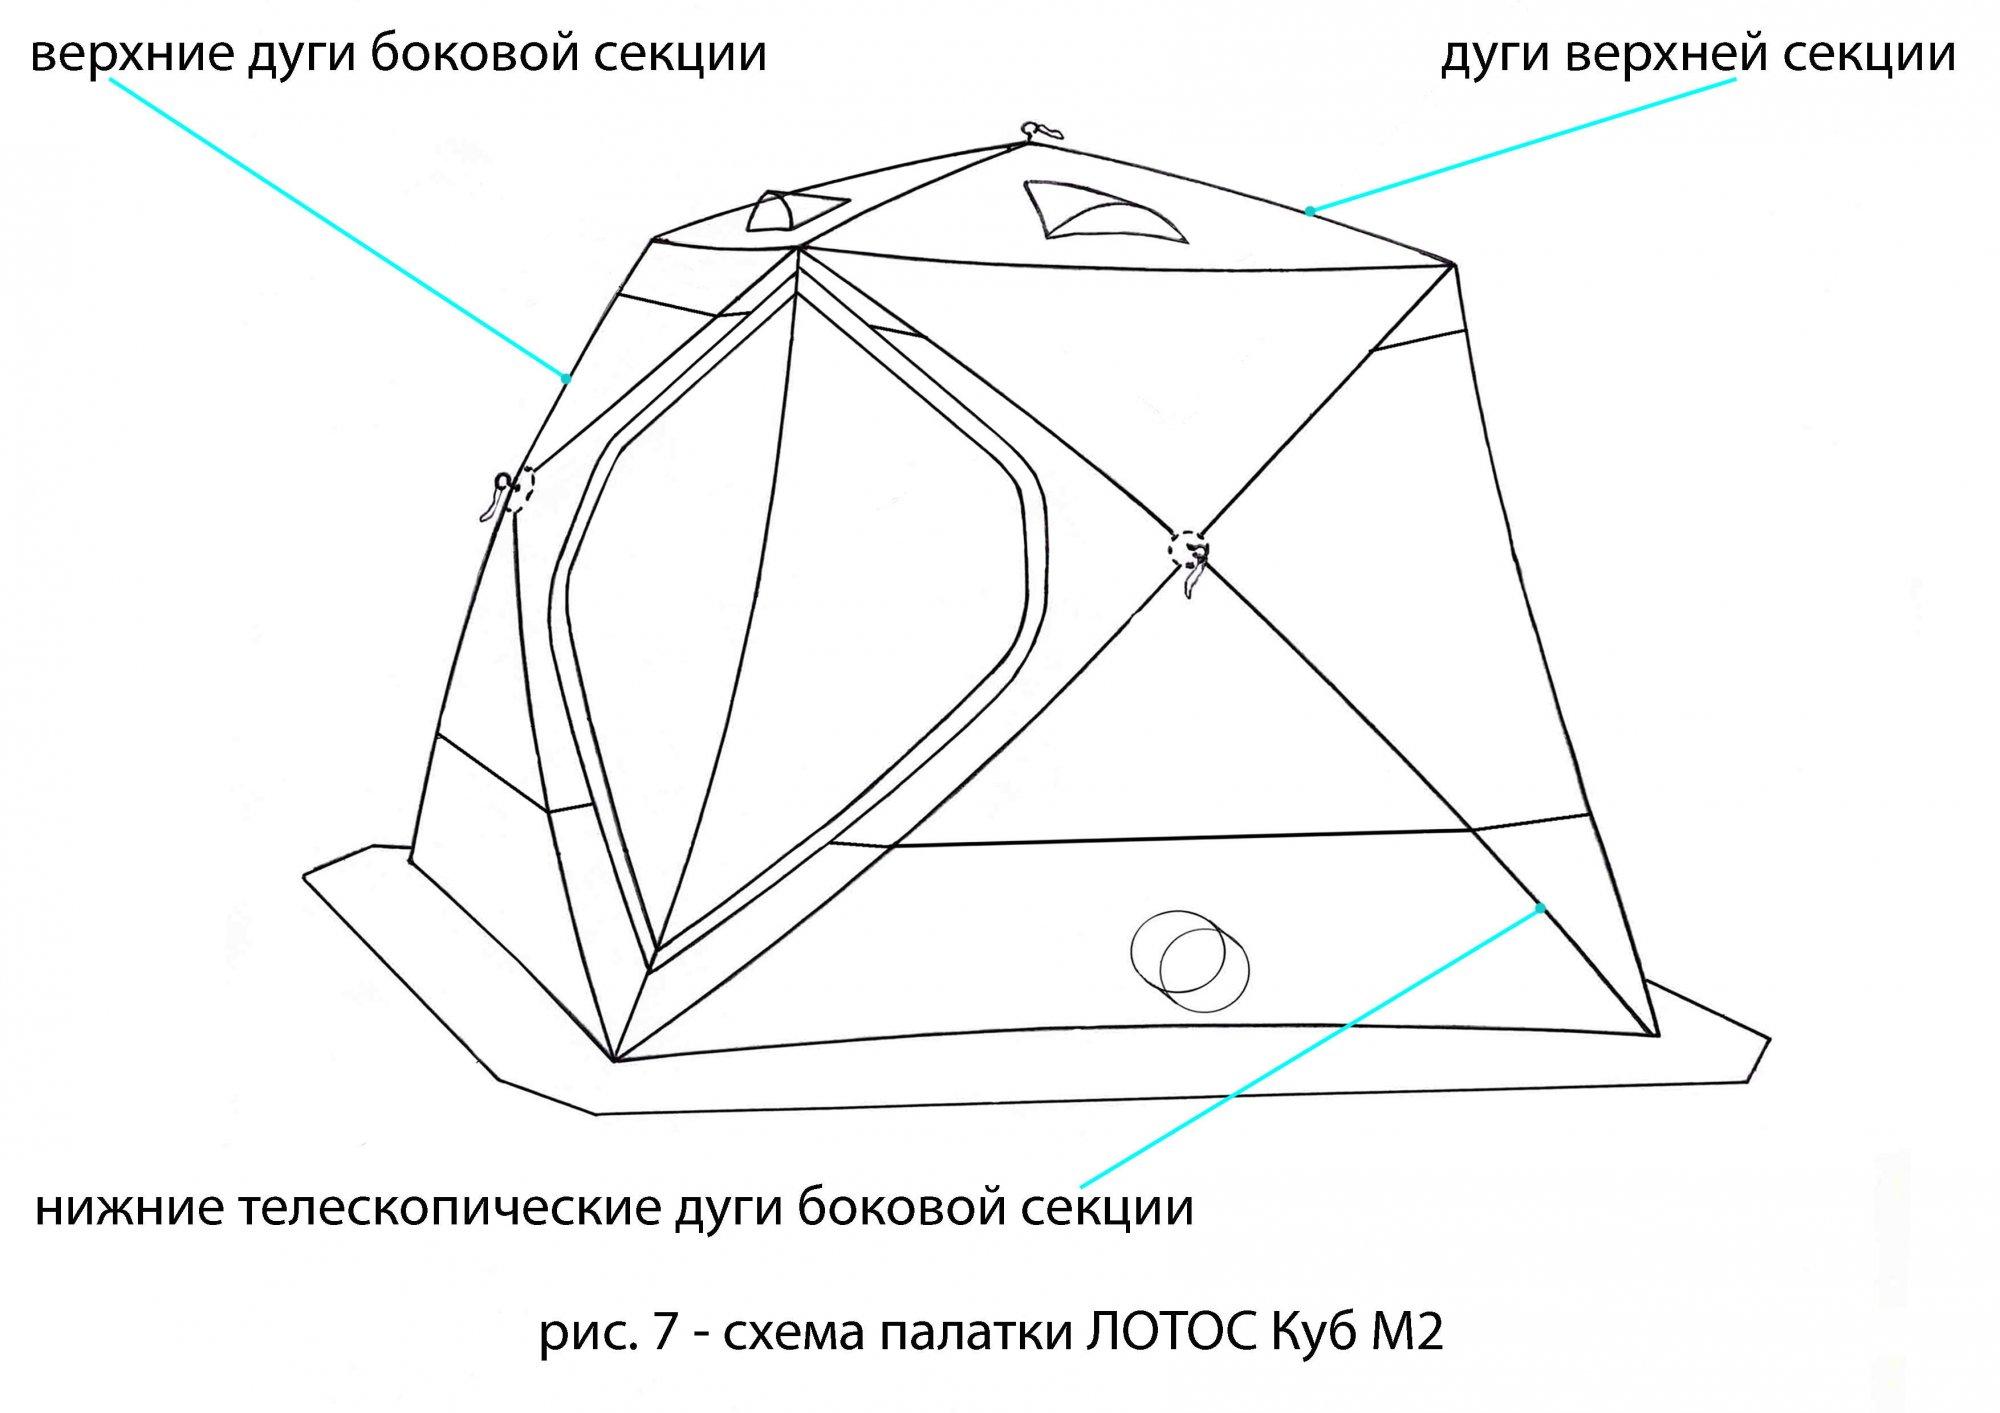 каркас палатки лотос куб м2